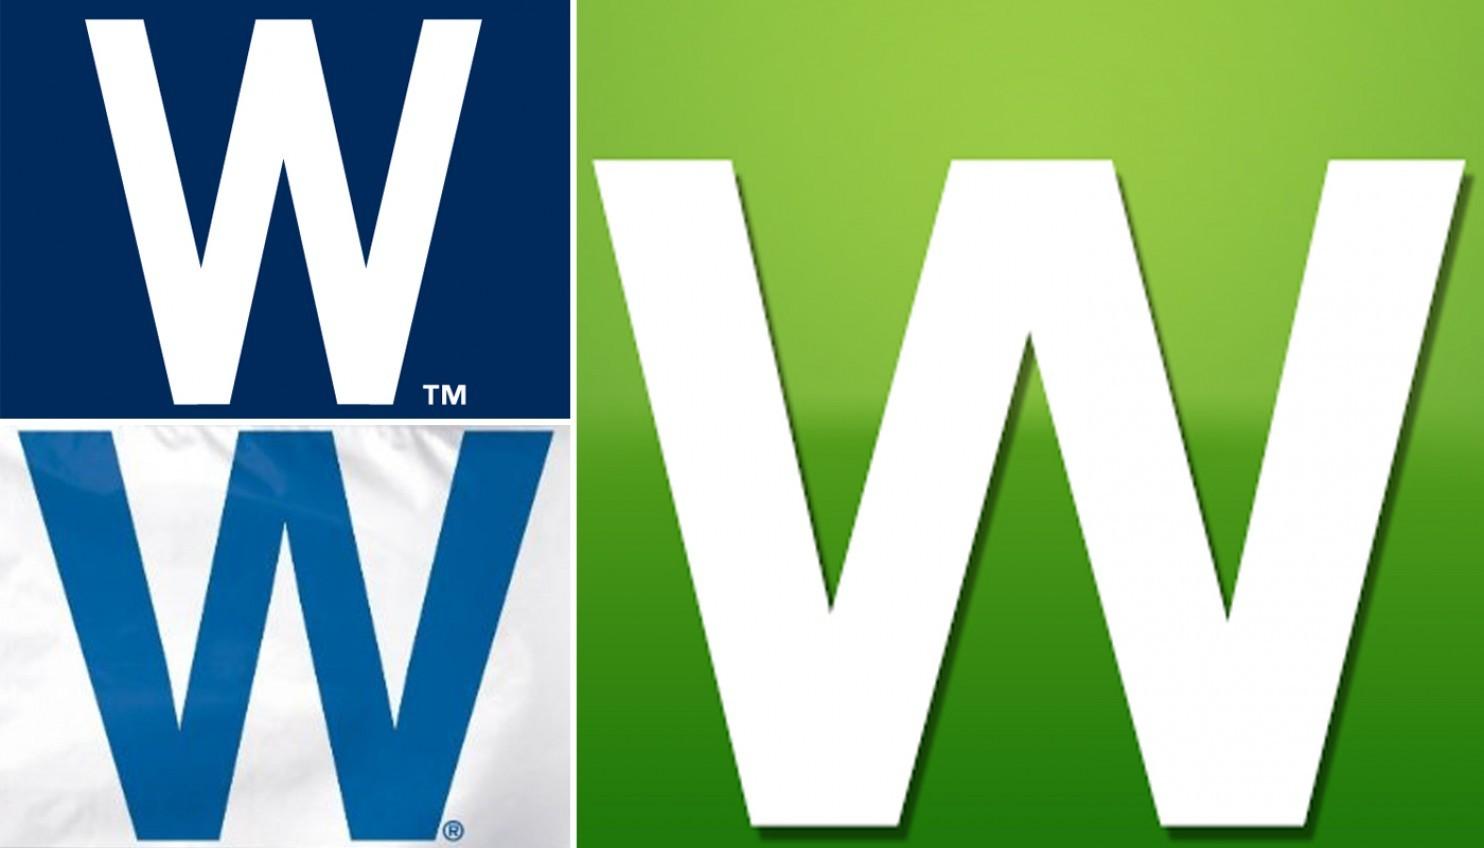 Logo Washington Nationals Walgreens